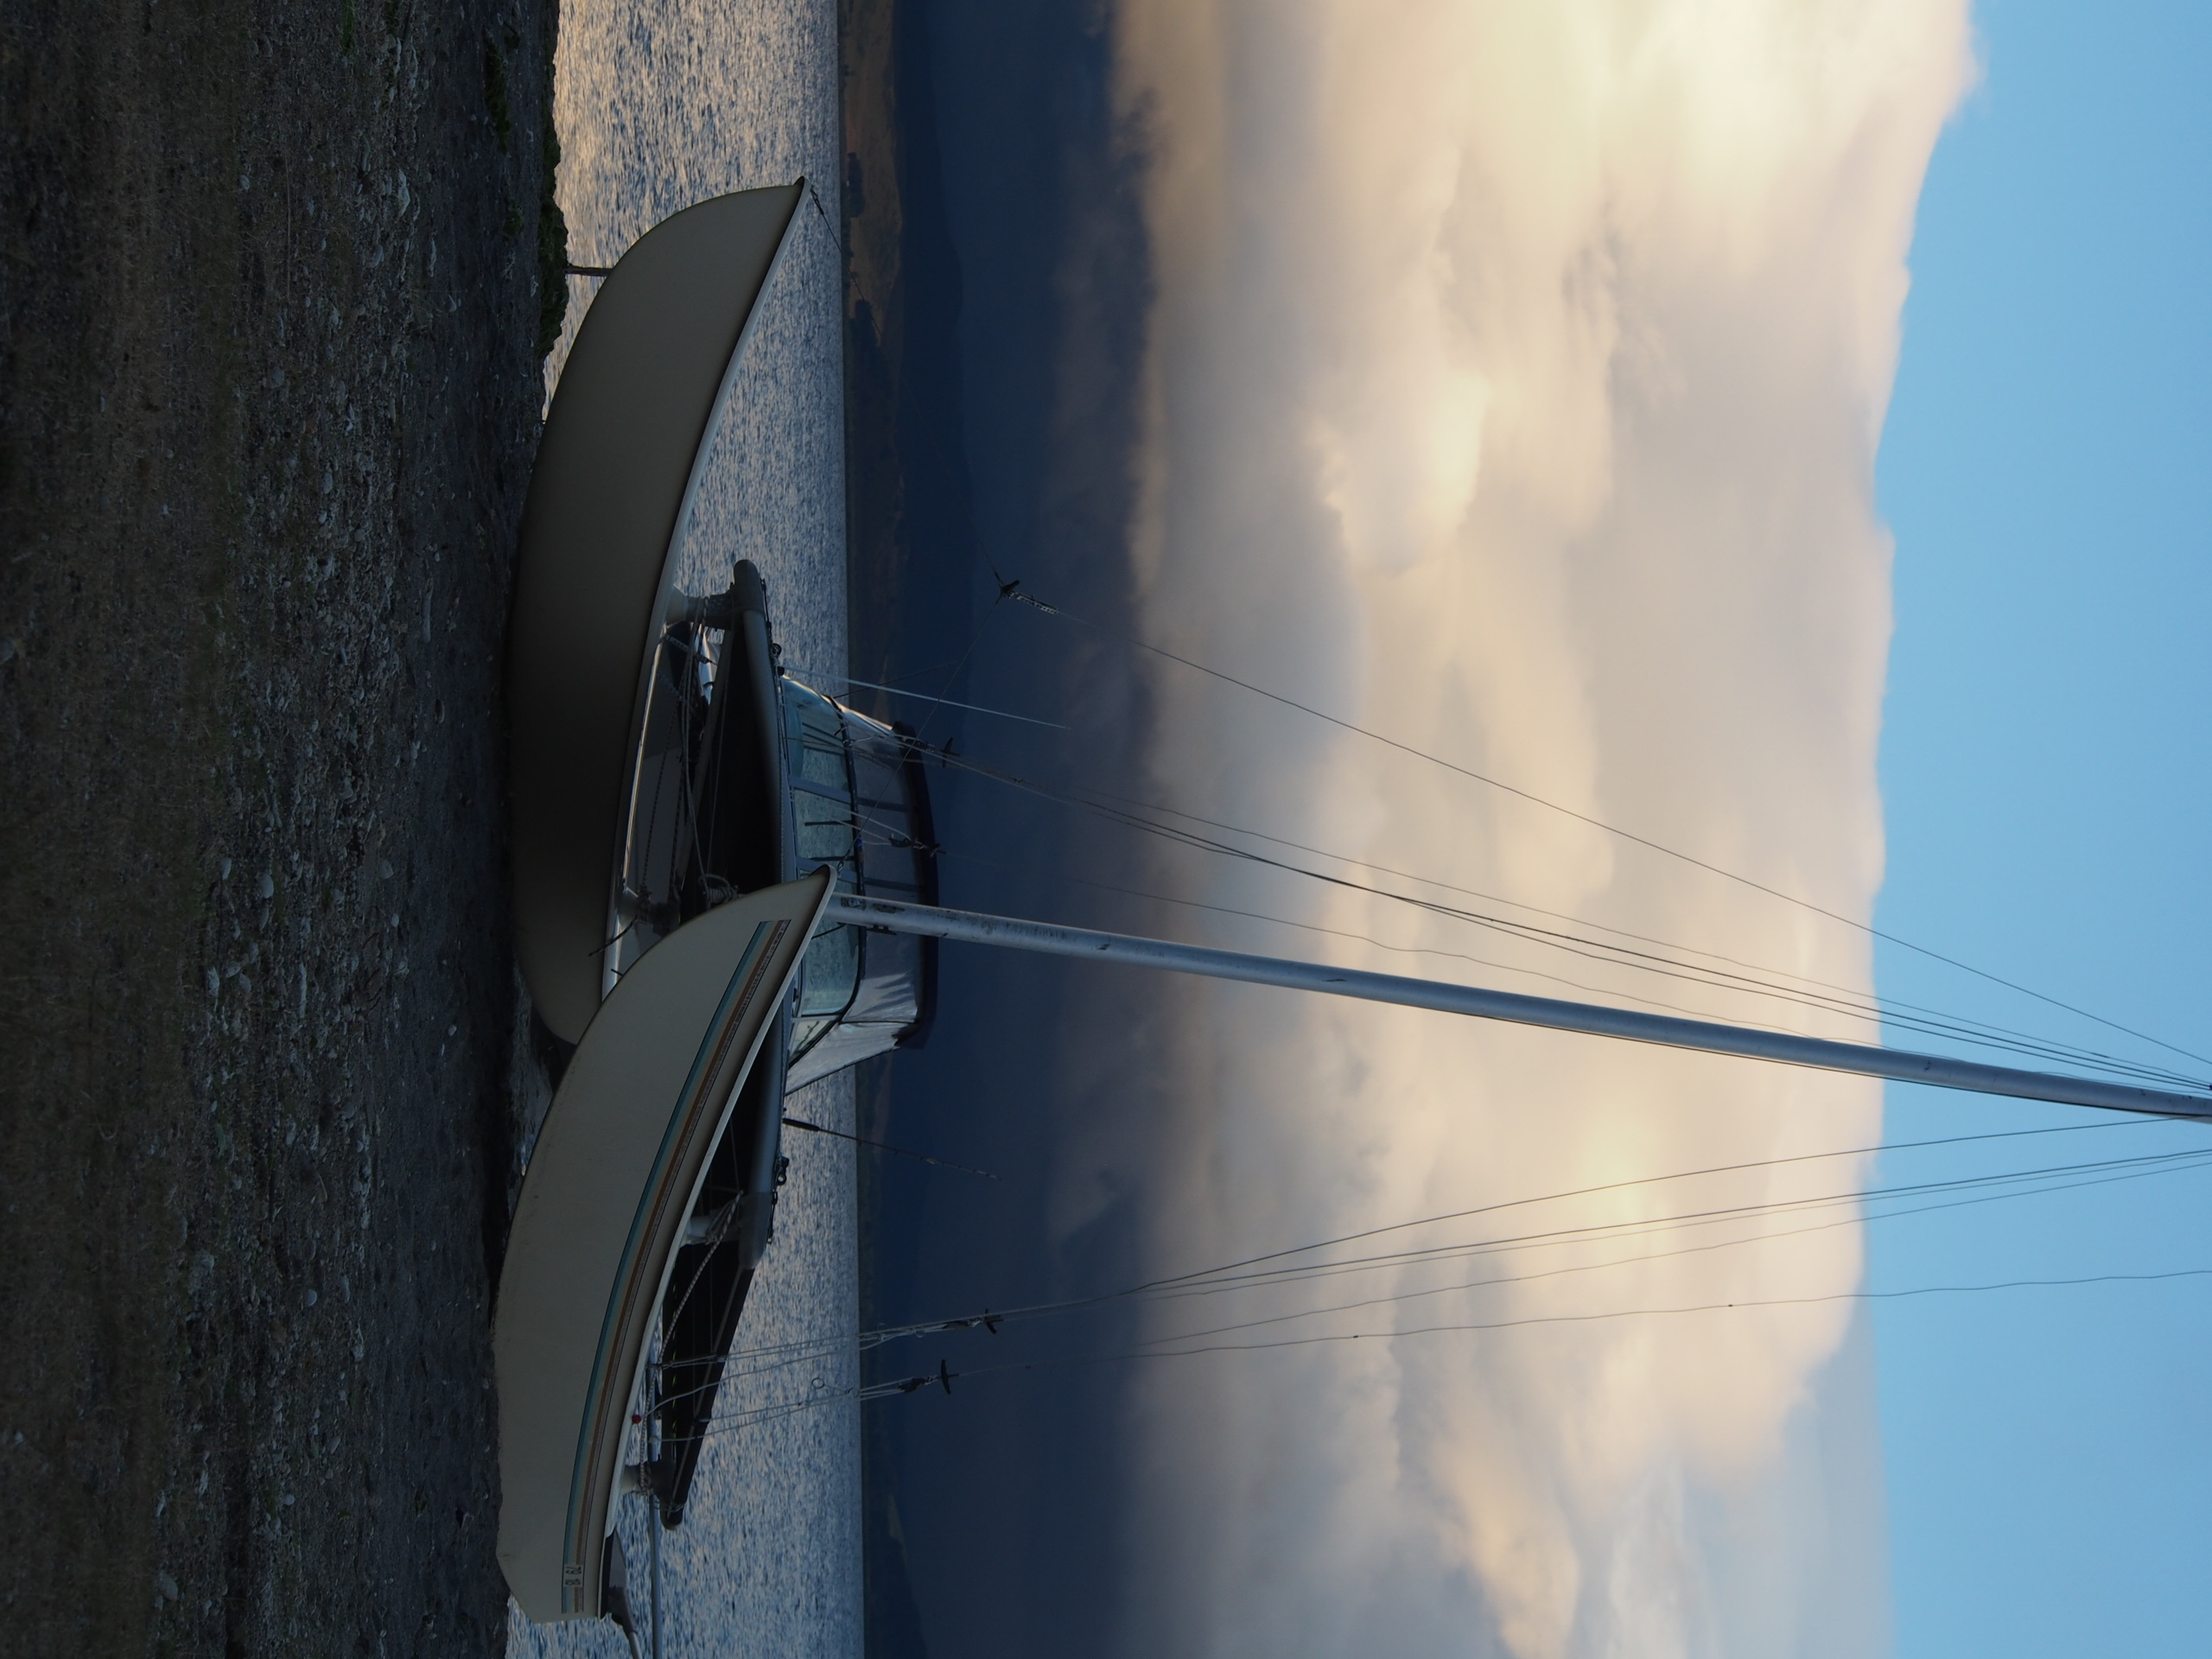 Taupo Boats, 2014